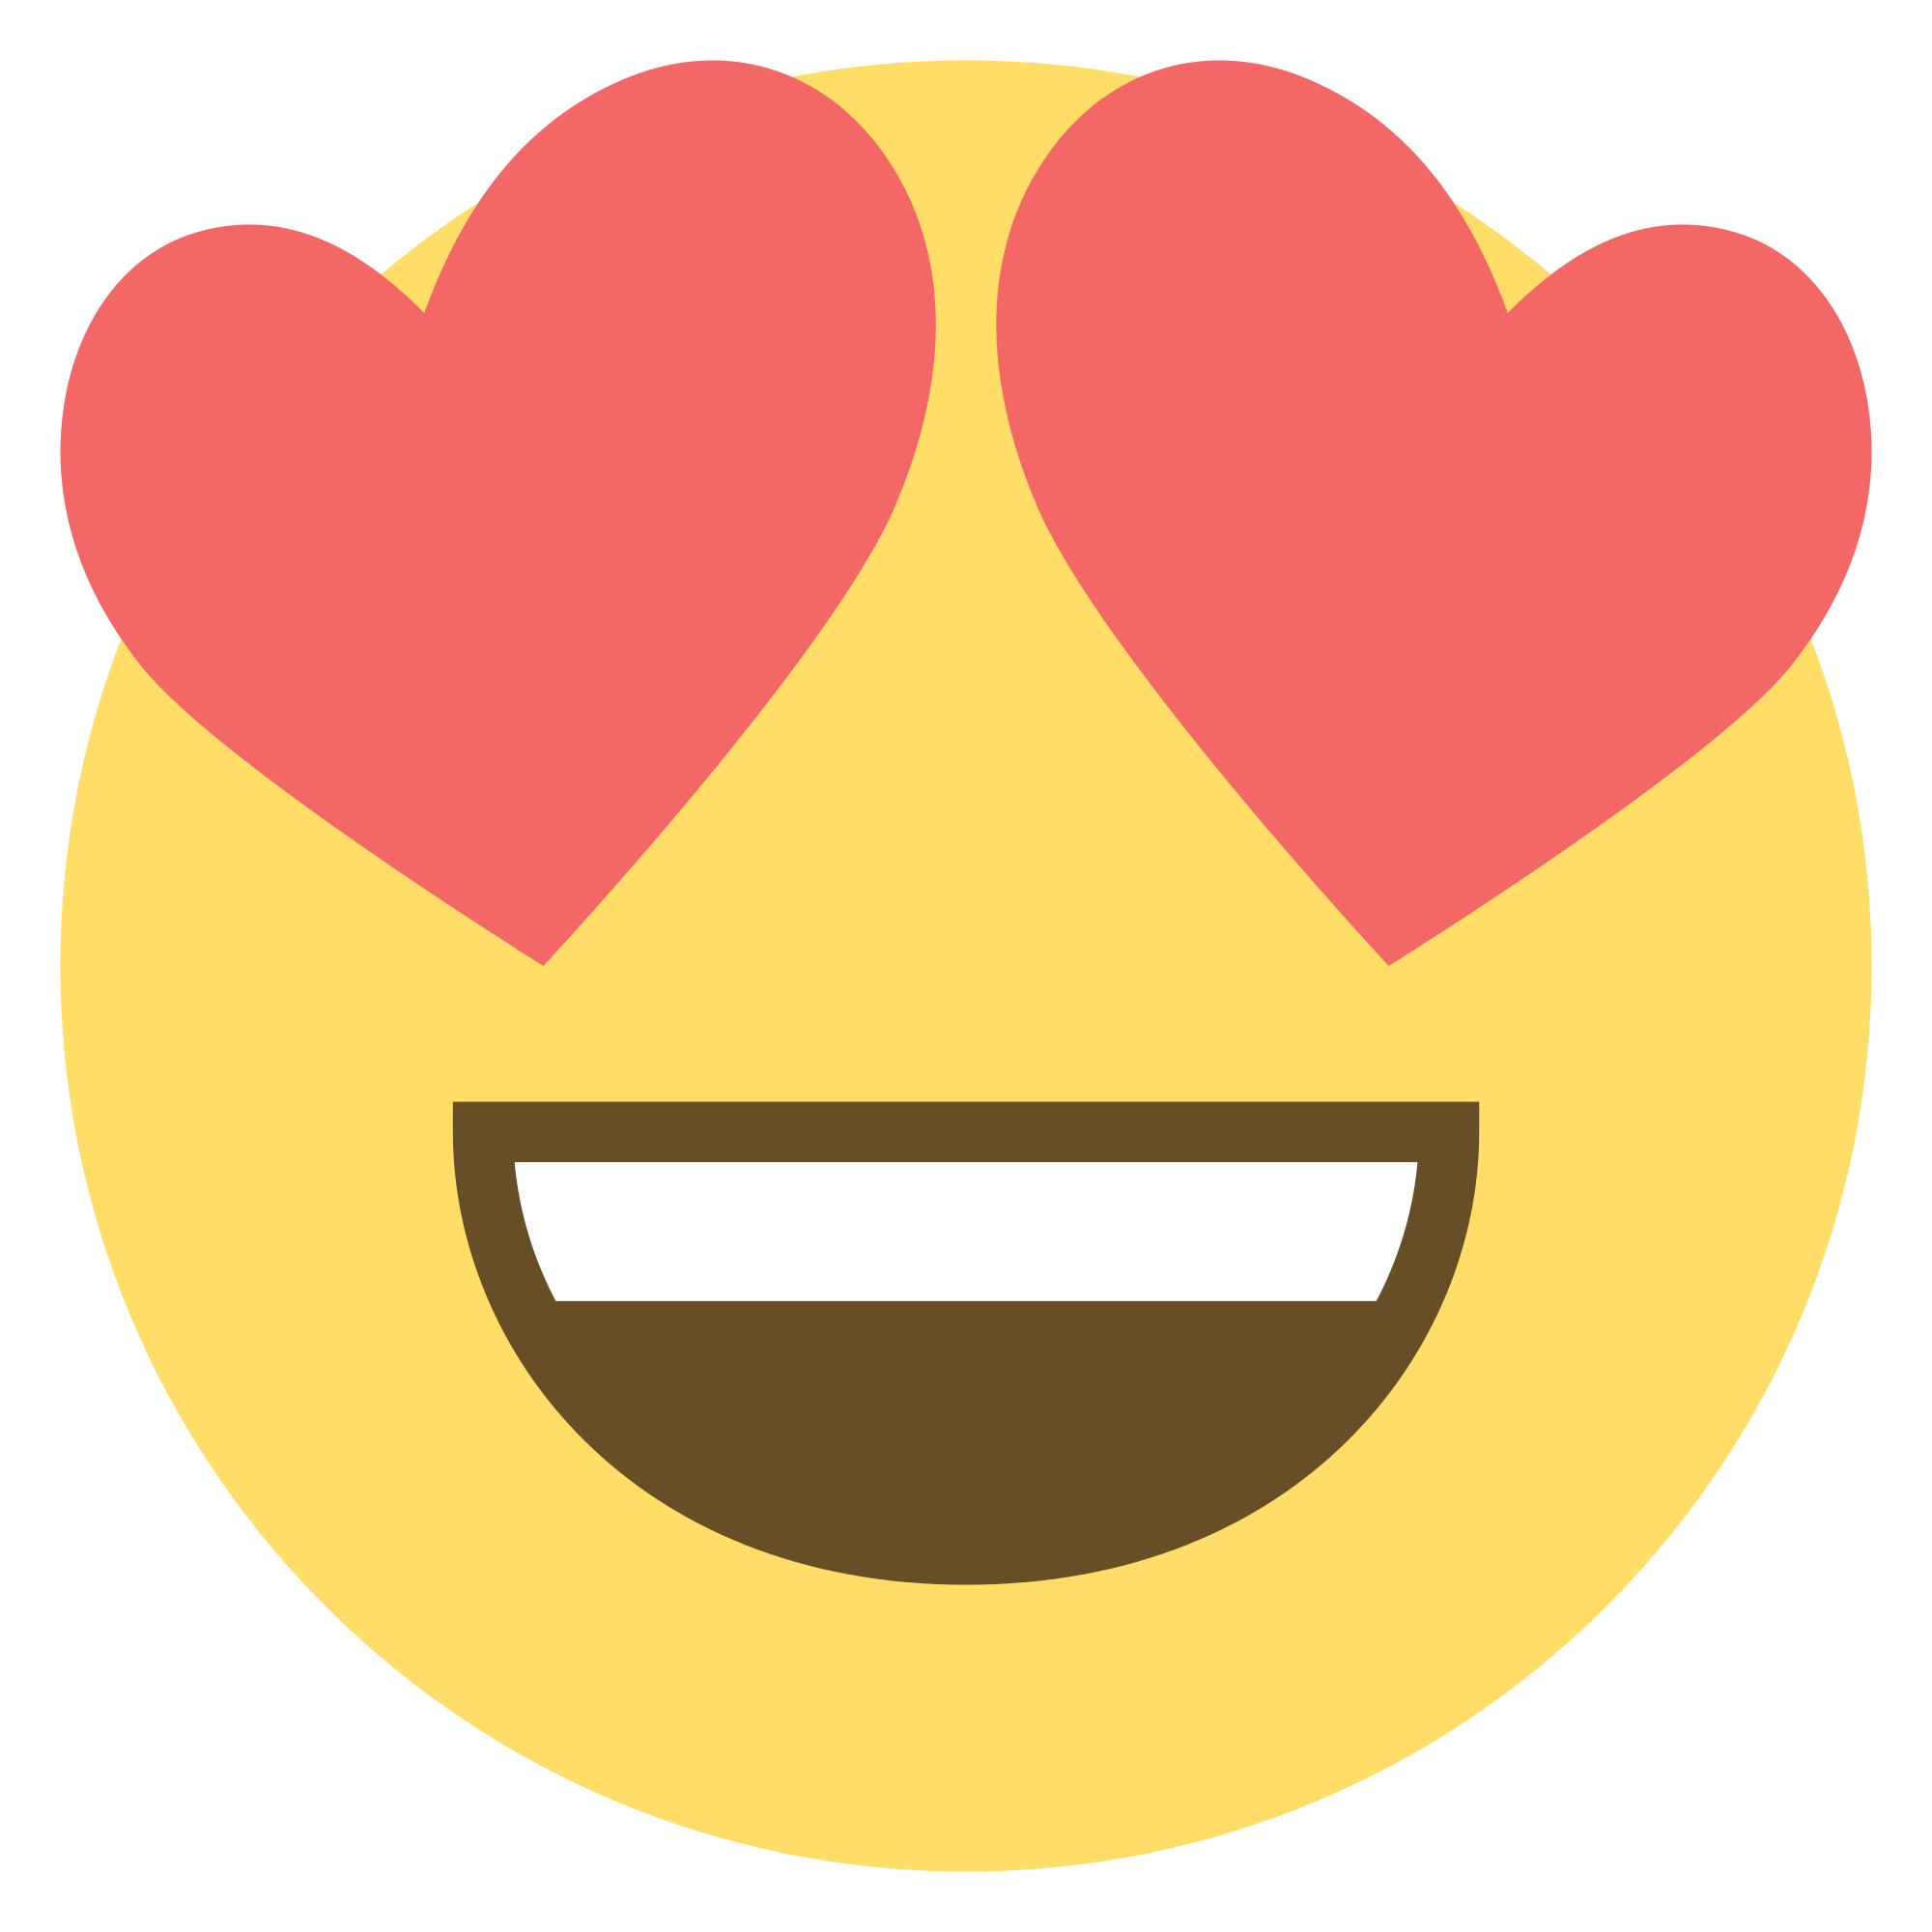 Emoji PNG - 3533